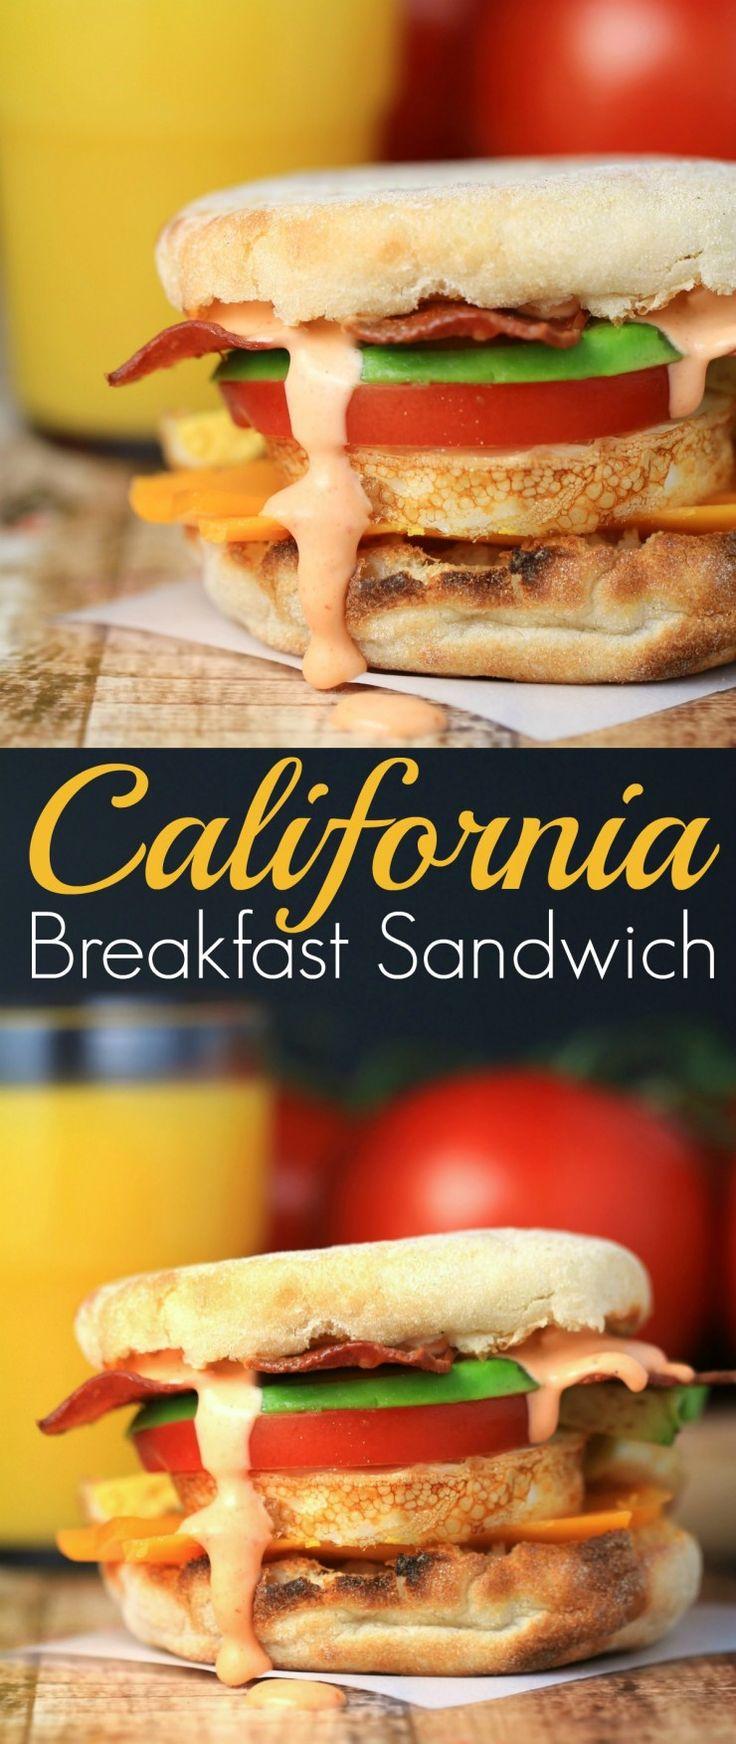 ... Breakfast Recipes on Pinterest | Granola, French Toast and Breakfast